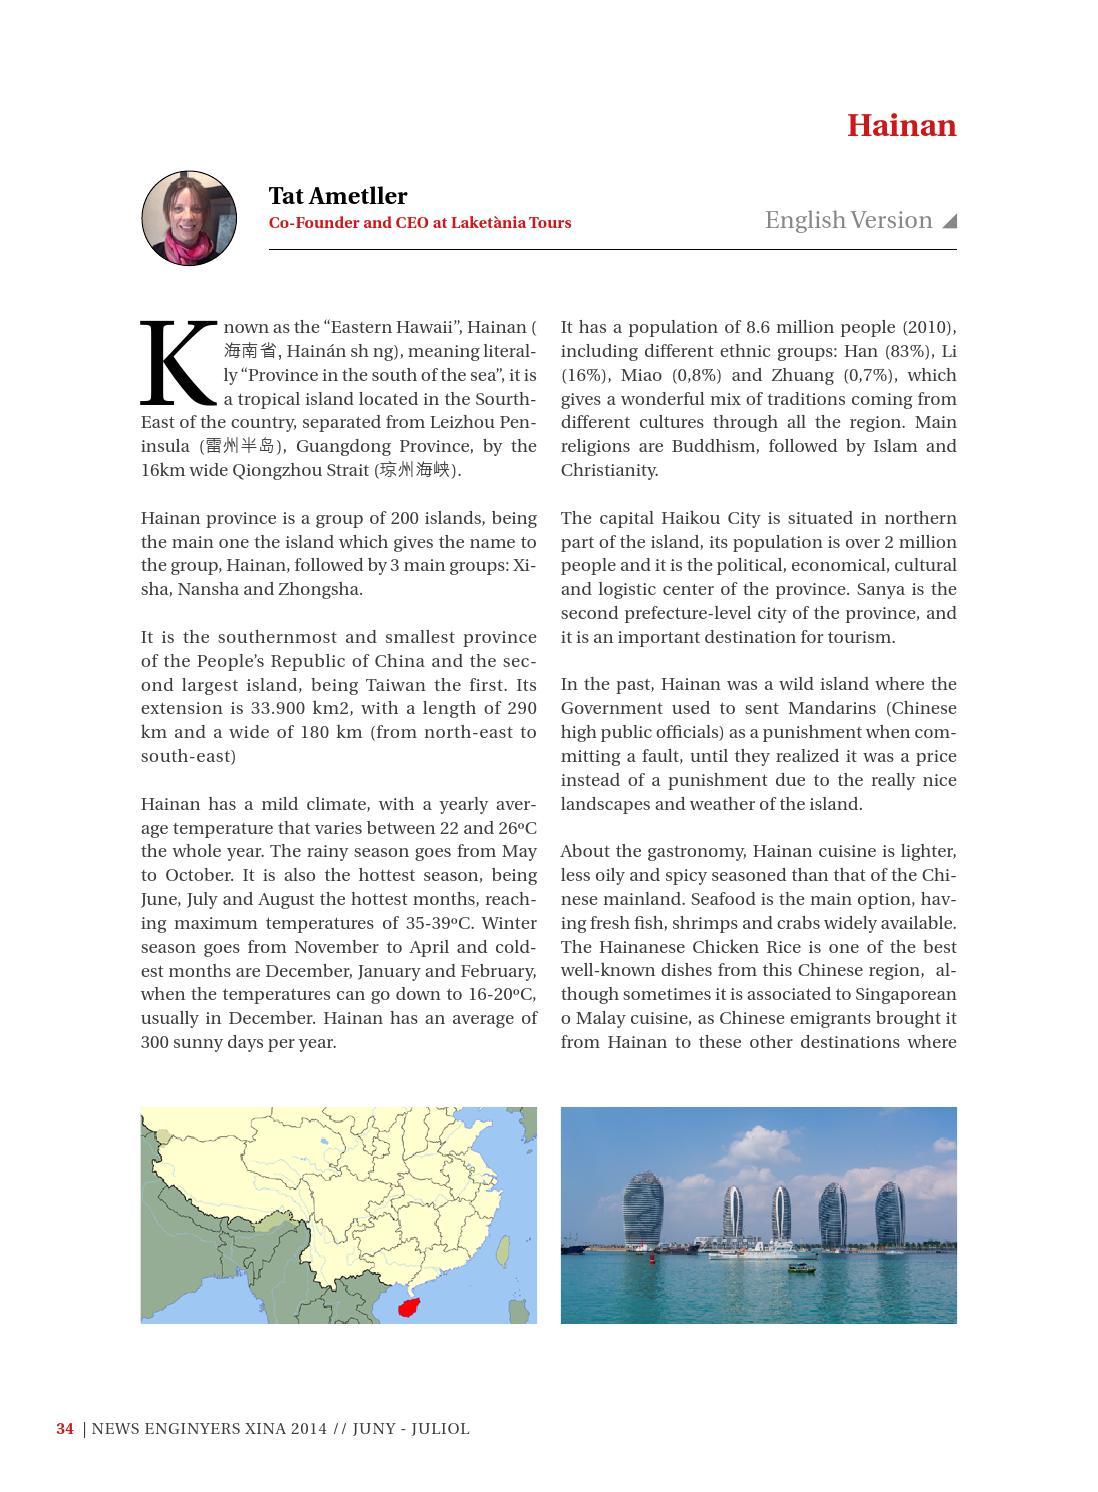 News Enginyers Xina - Juny - Juliol 2014 by Col·legi d